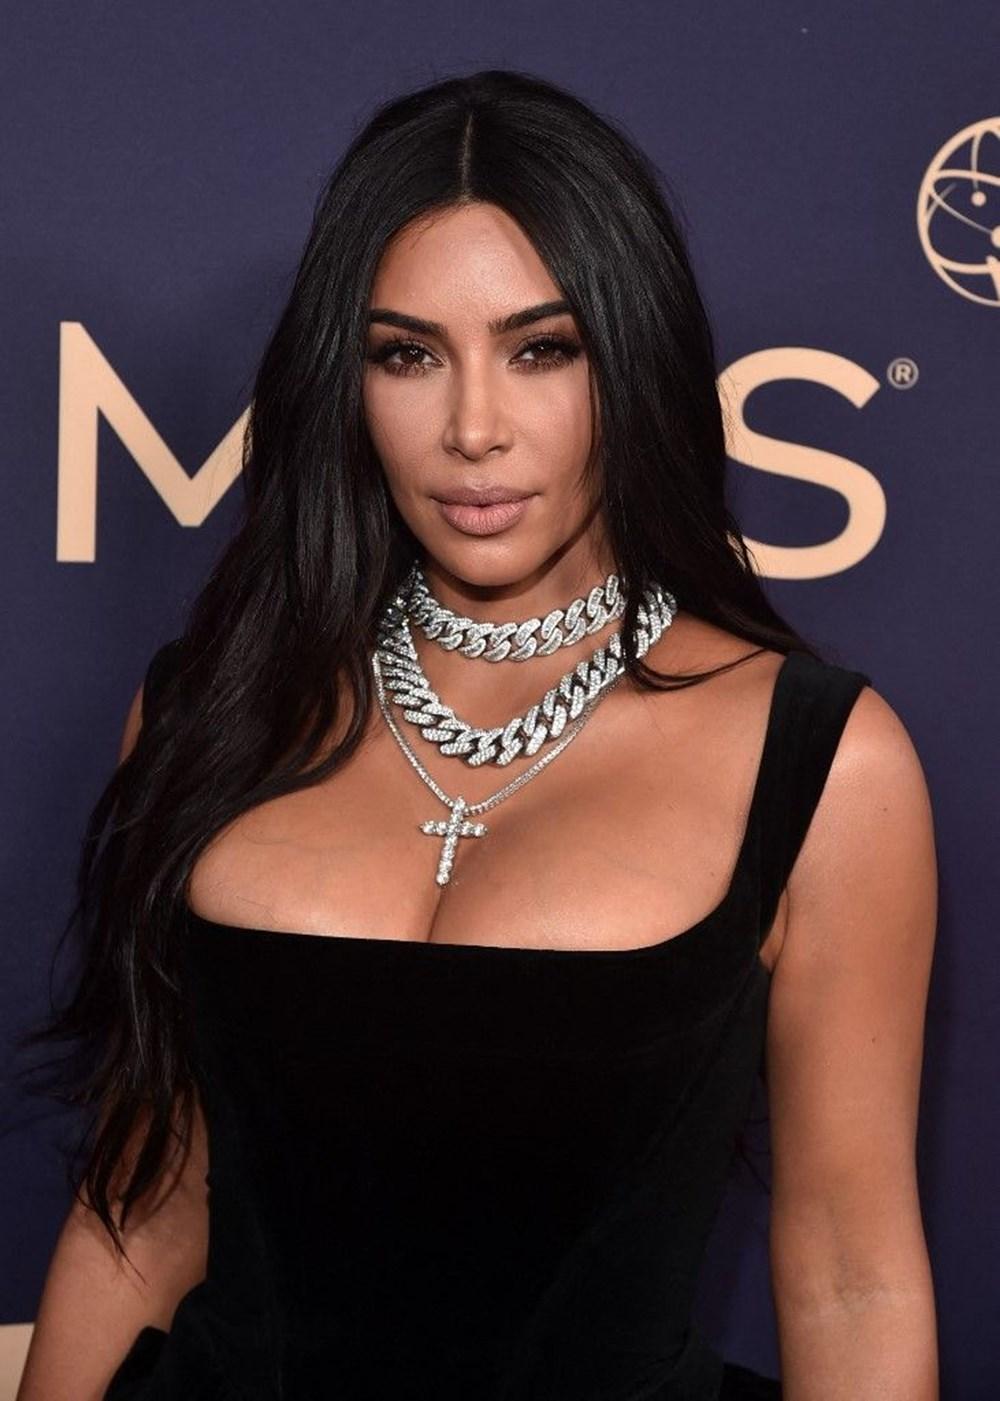 Kim Kardashian'a elmas yüzük ve doğum kontrol hapıyla taciz - 9